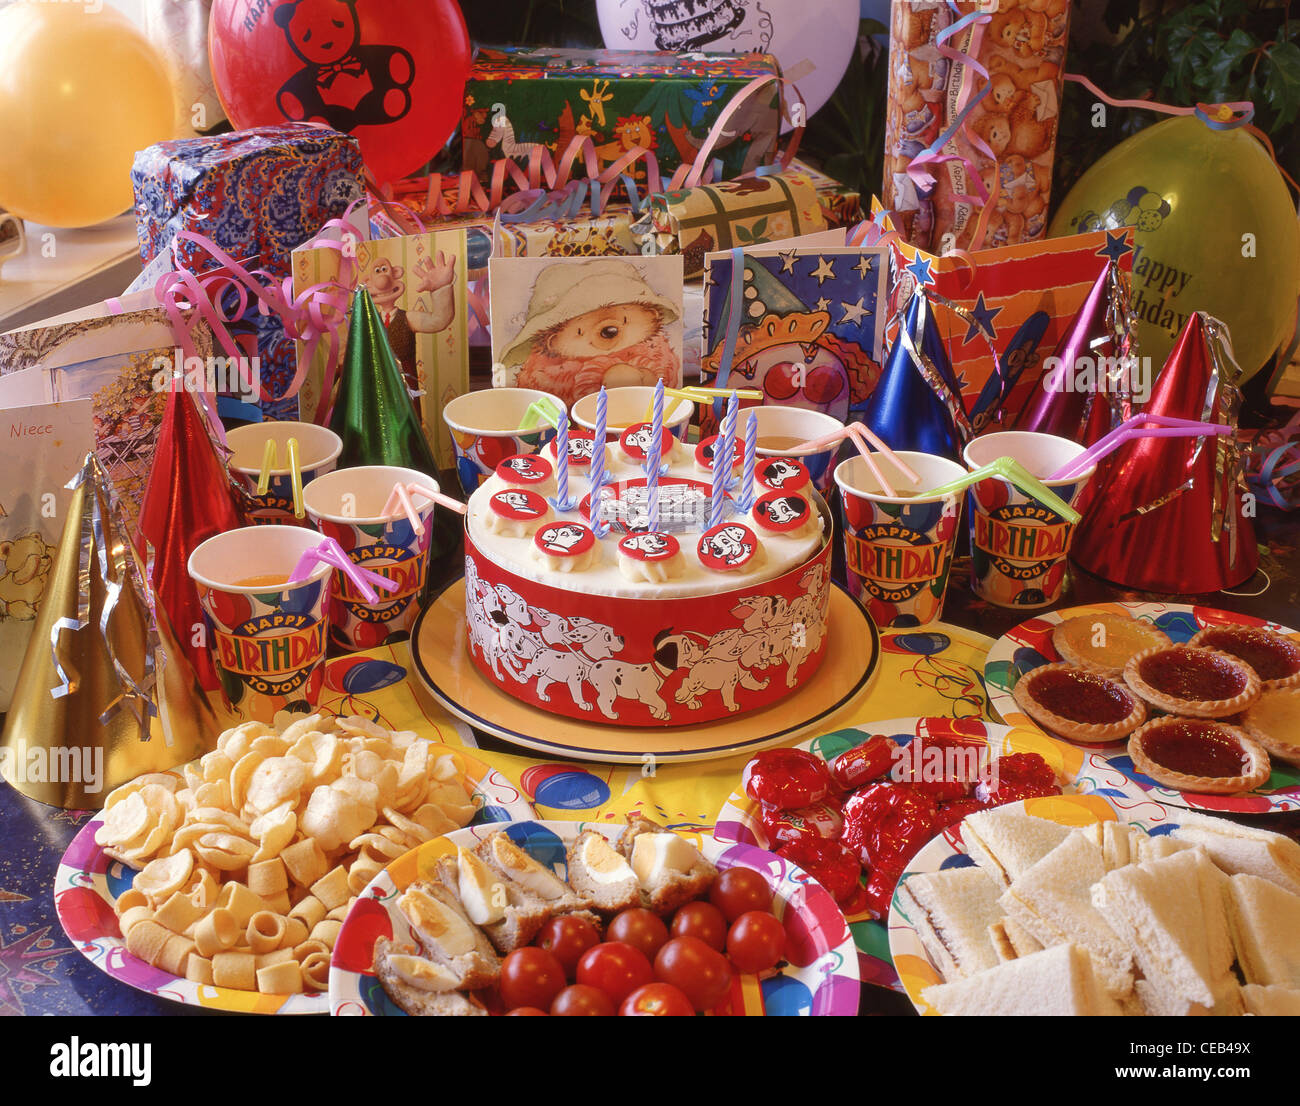 Childrens Birthday Party Food Spread Berkshire England